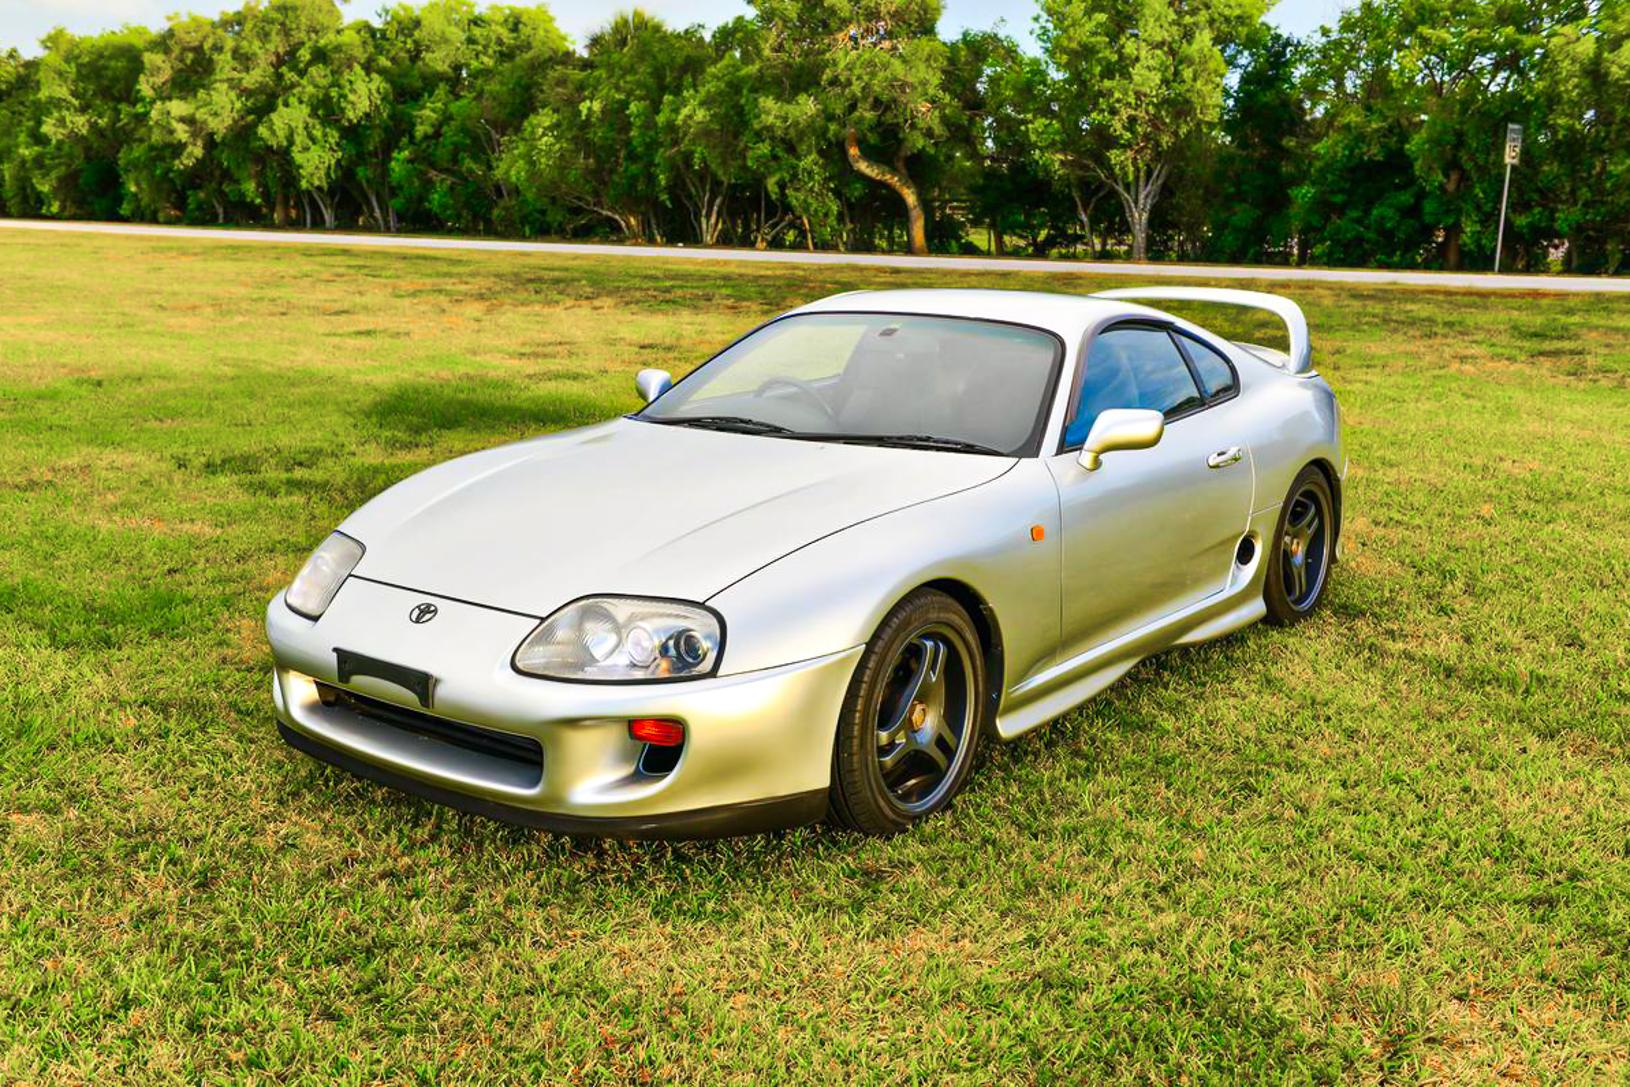 1993 Toyota Supra Turbo 'RHD'